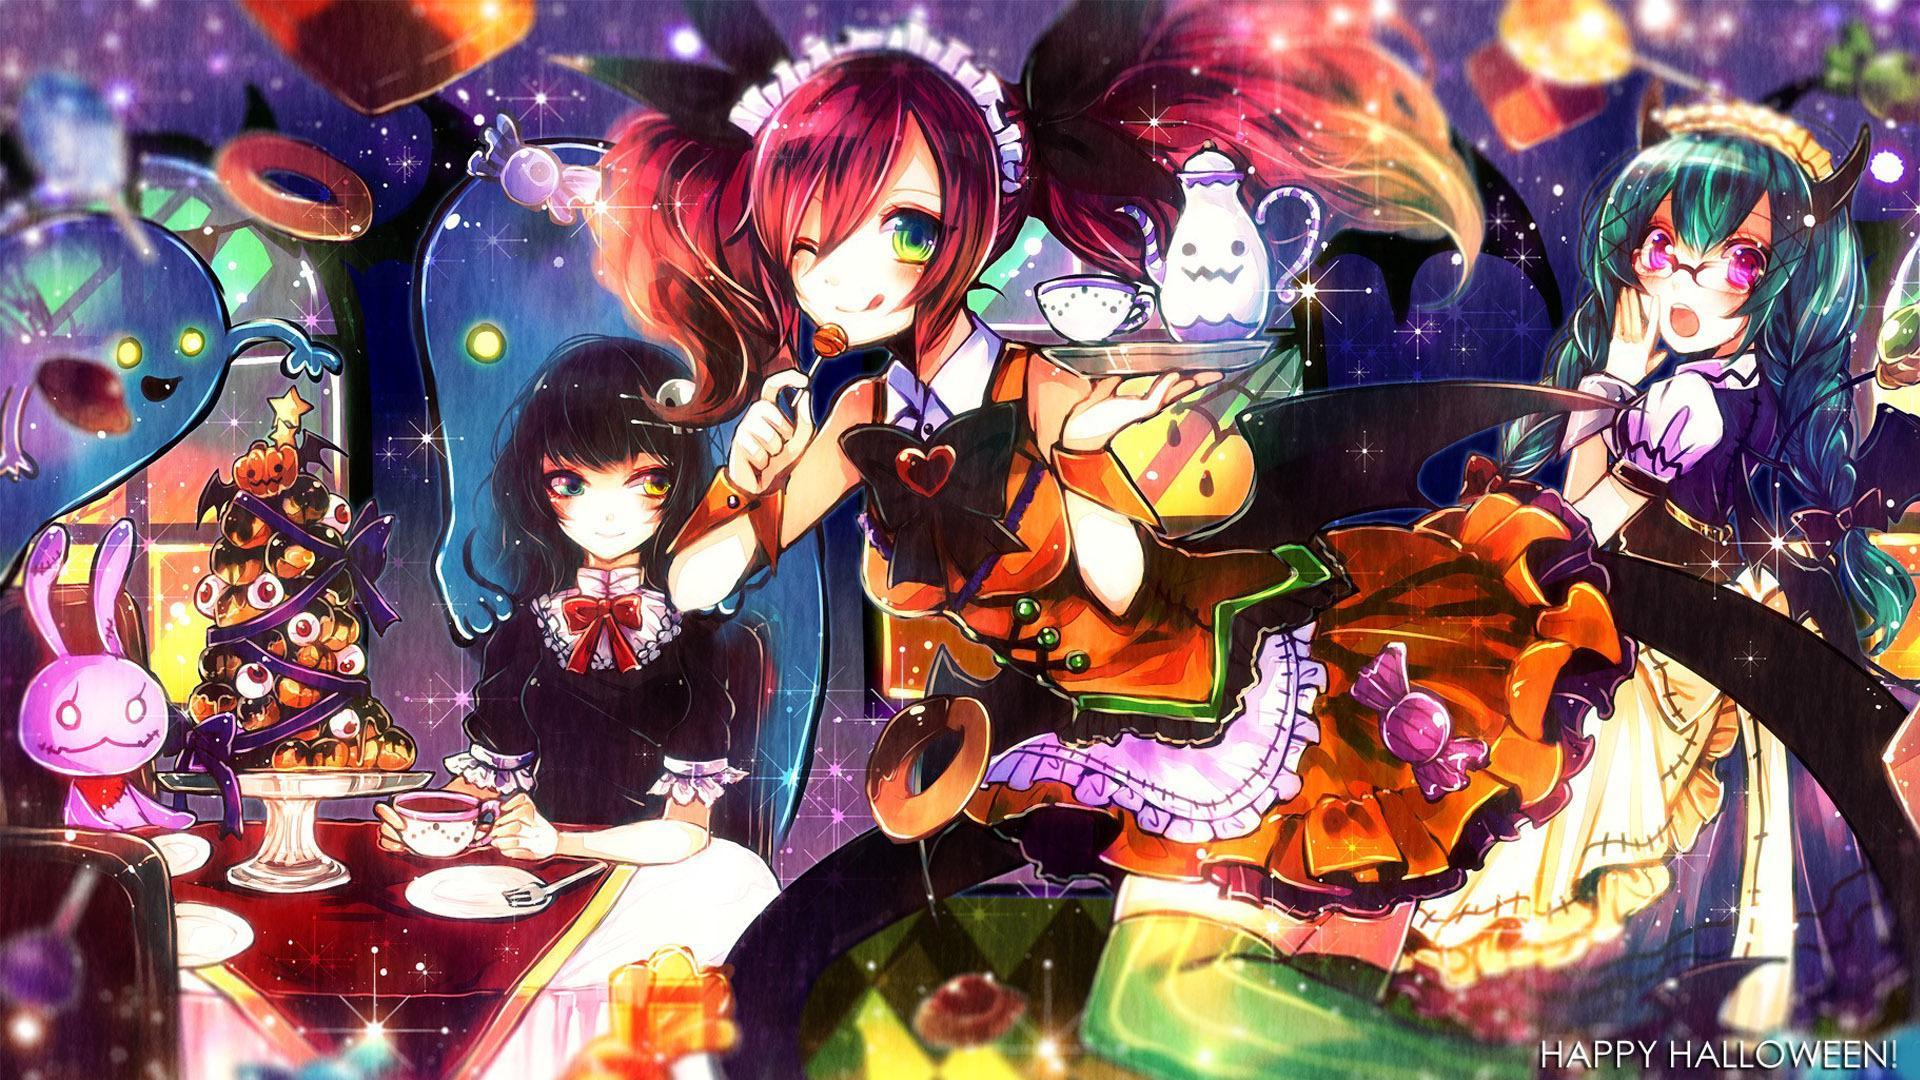 Free Download Anime Halloween Wallpaper HD